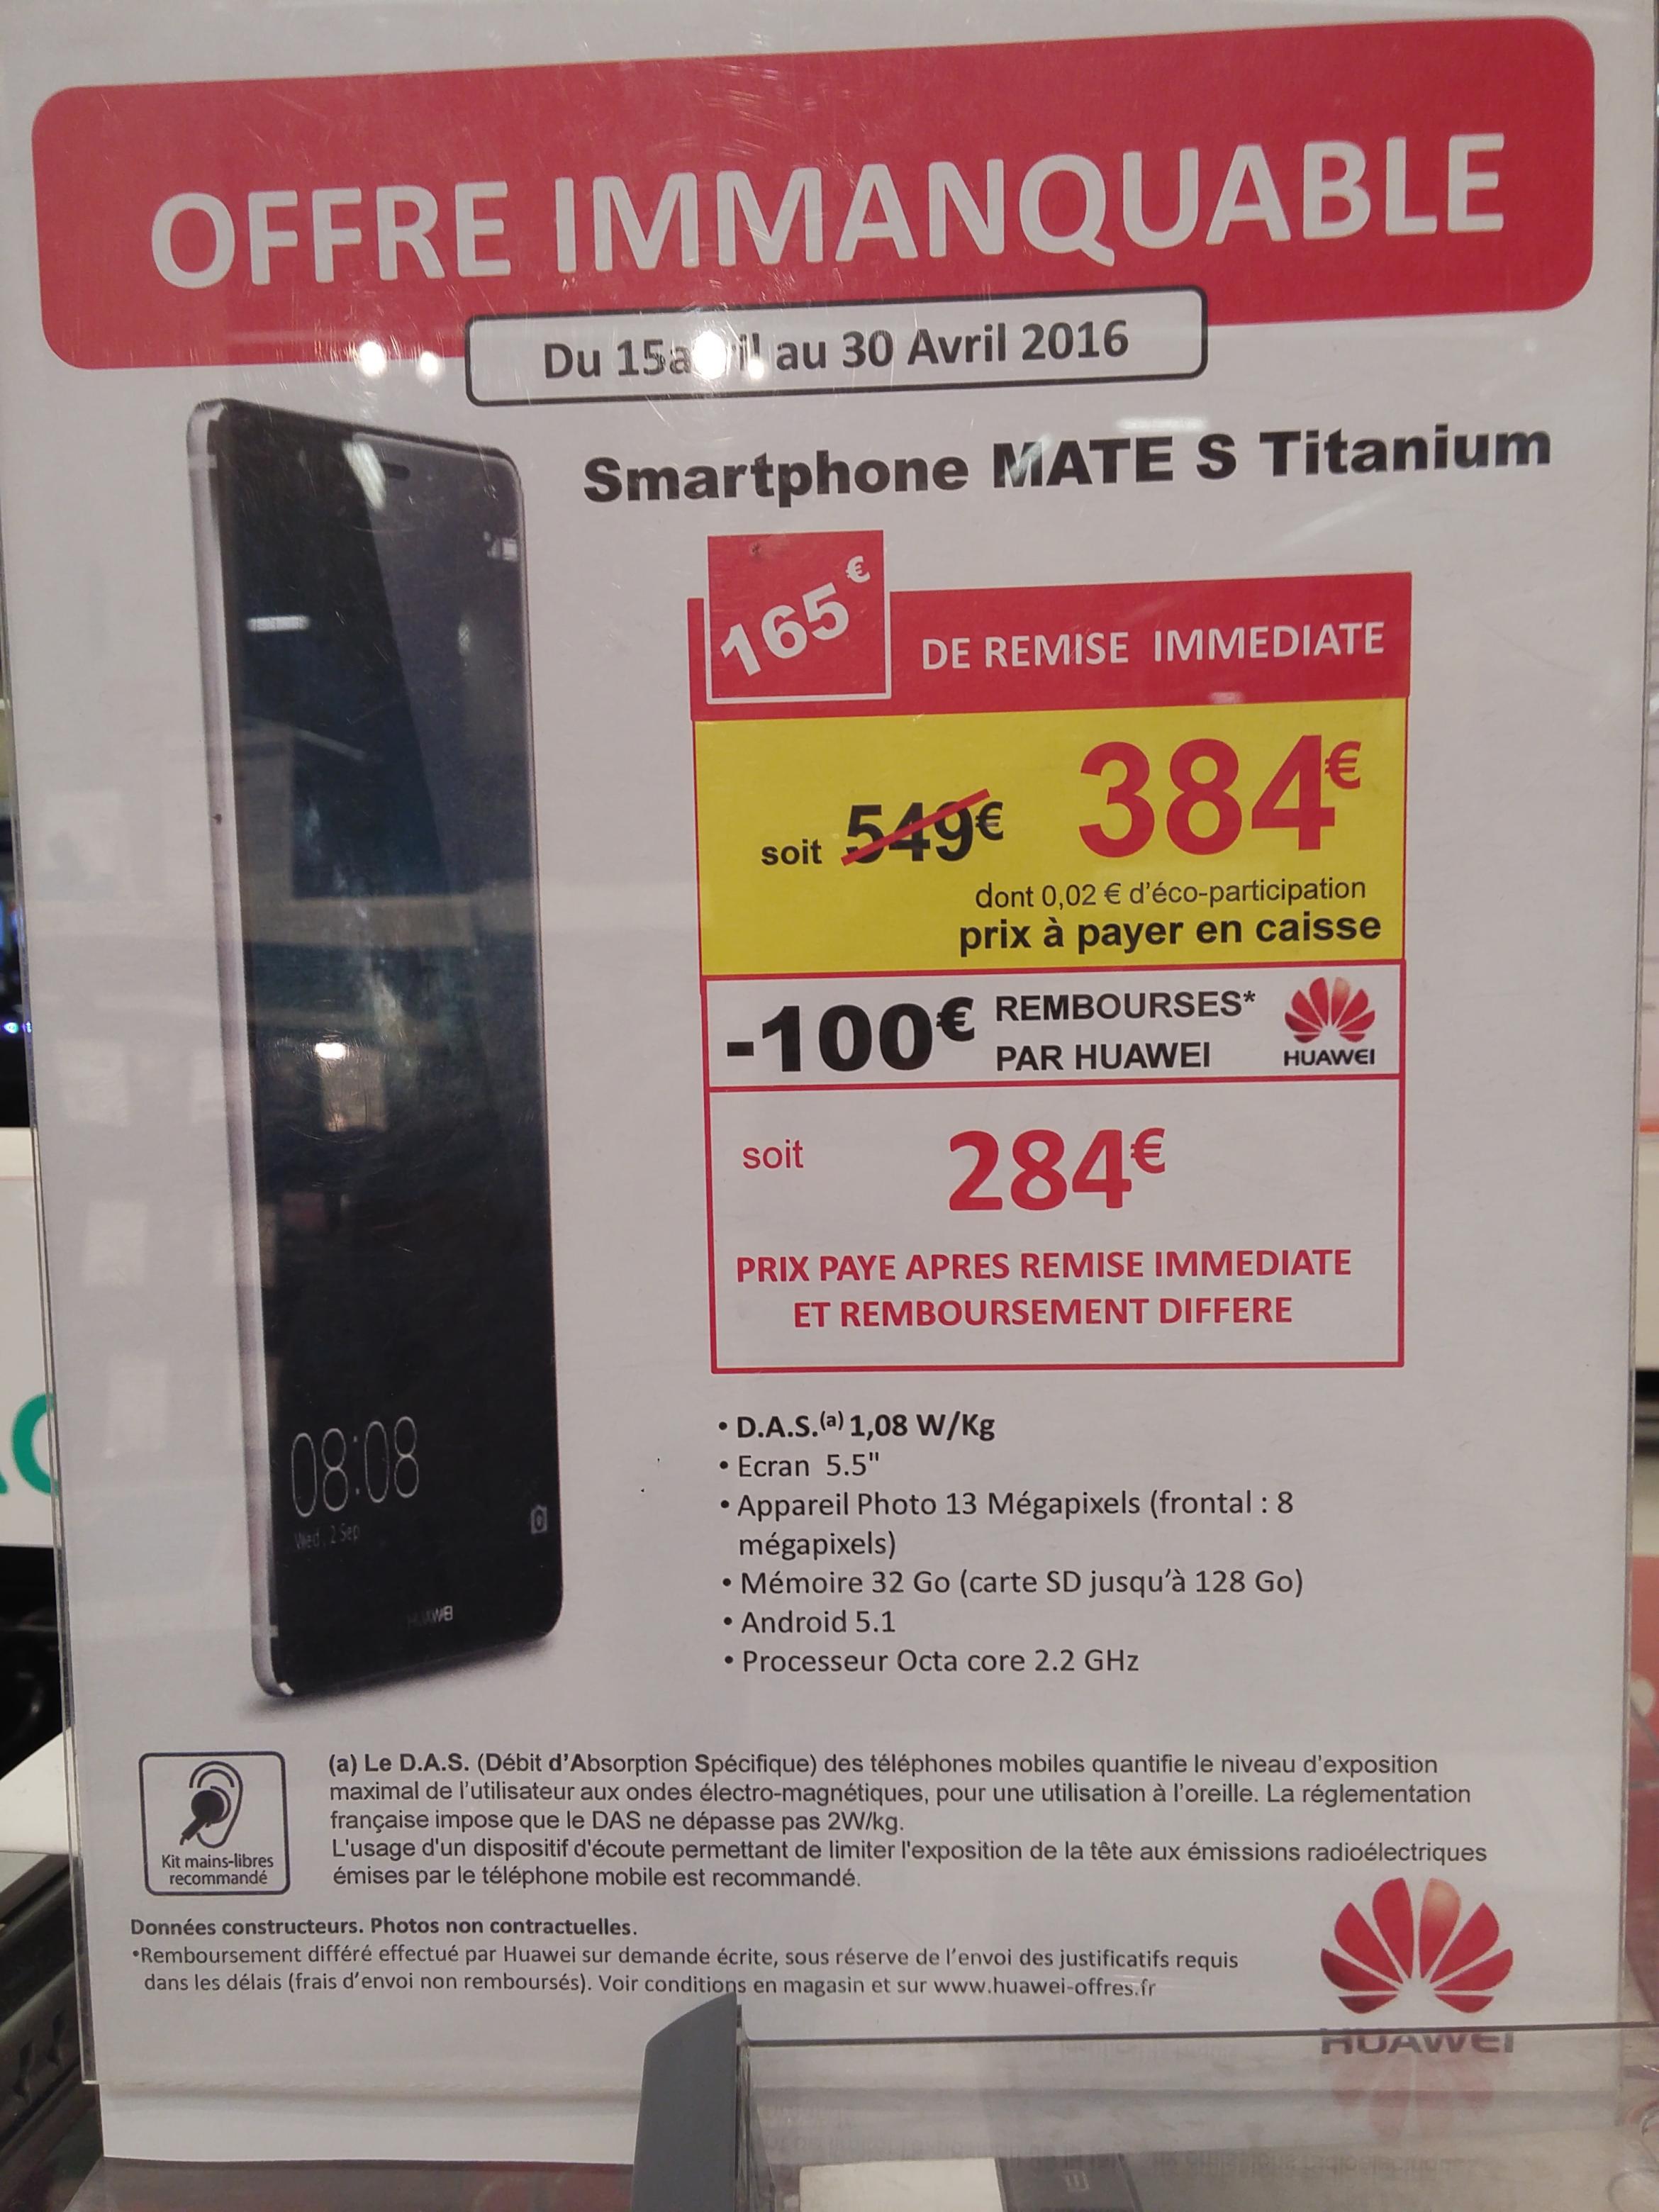 Sélection d'articles Huawei en promo - Ex : Smartphone  Huawei Mate S (via ODR 100€)